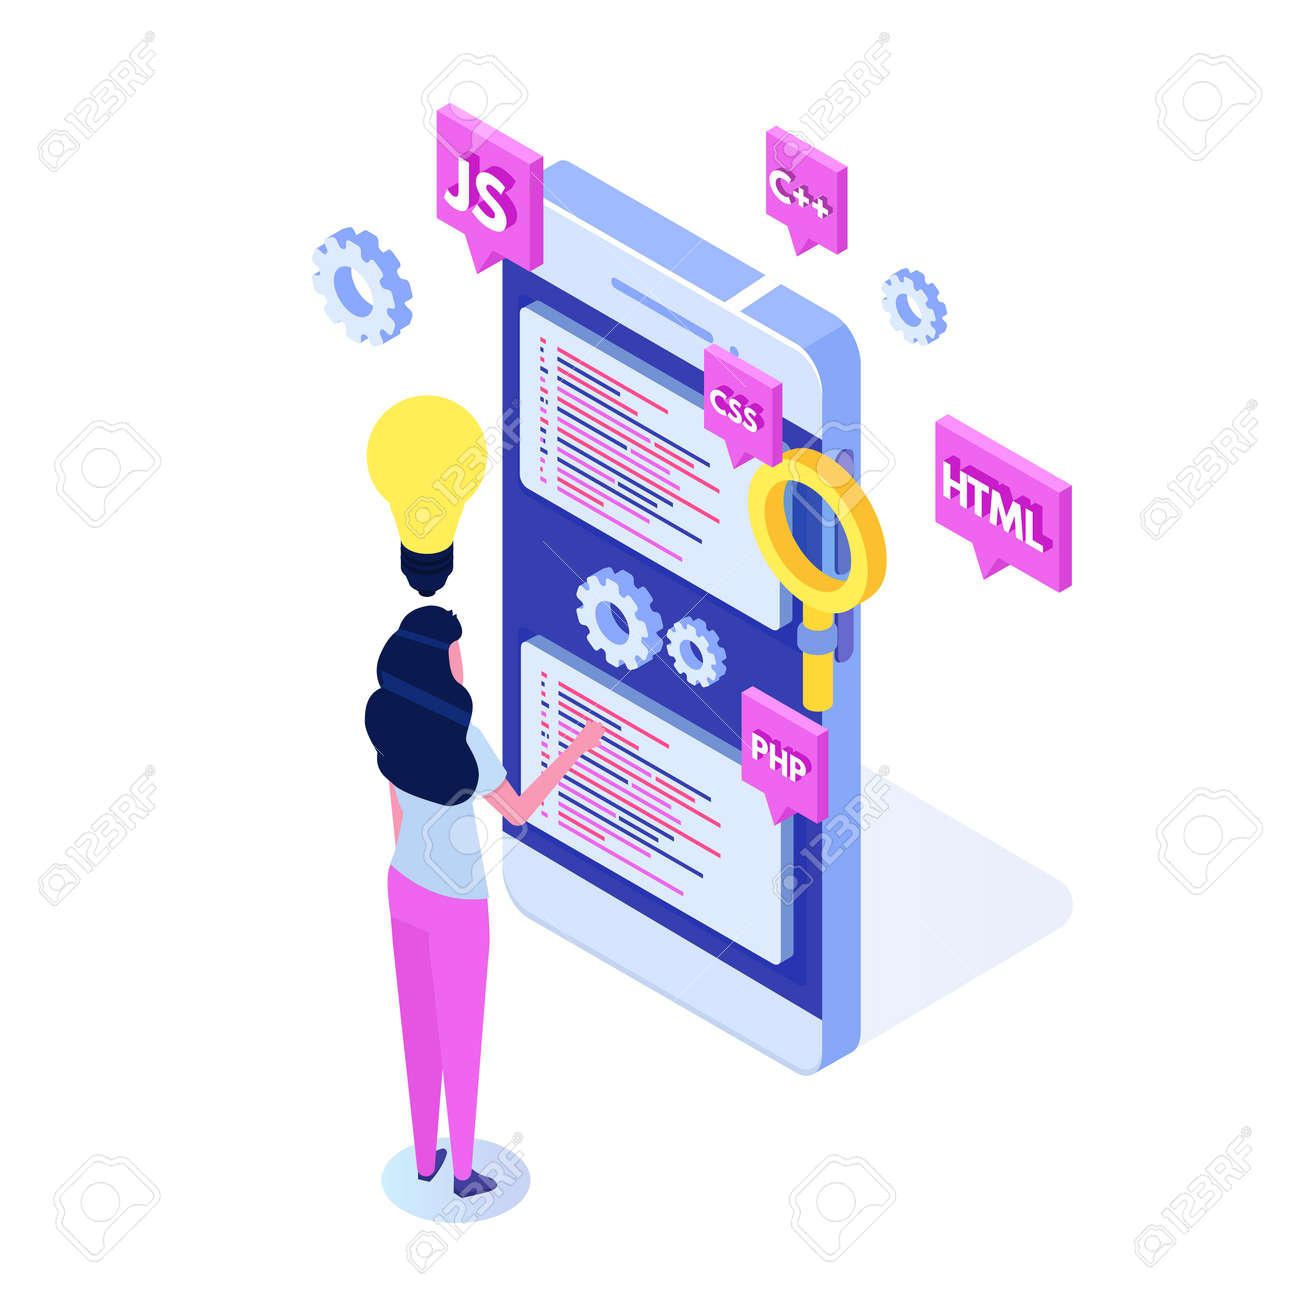 Programming Software or app development isometric concept, big